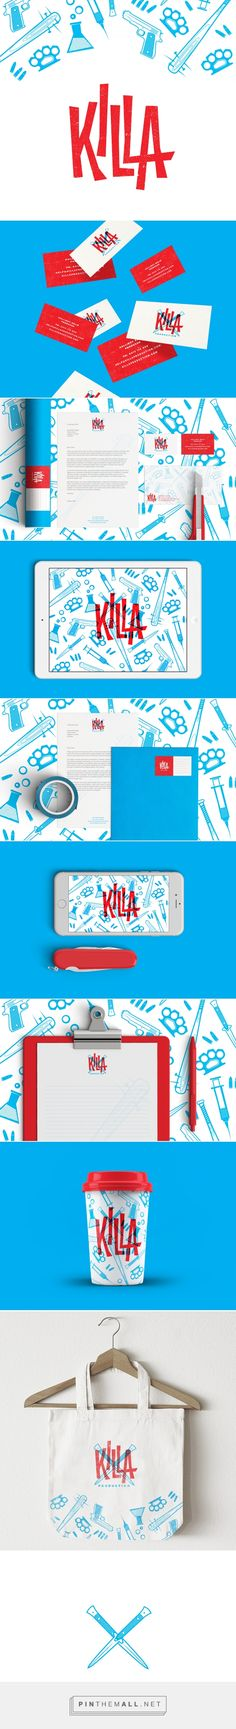 Project: Killa Production branding | Designer: Nick Edlin